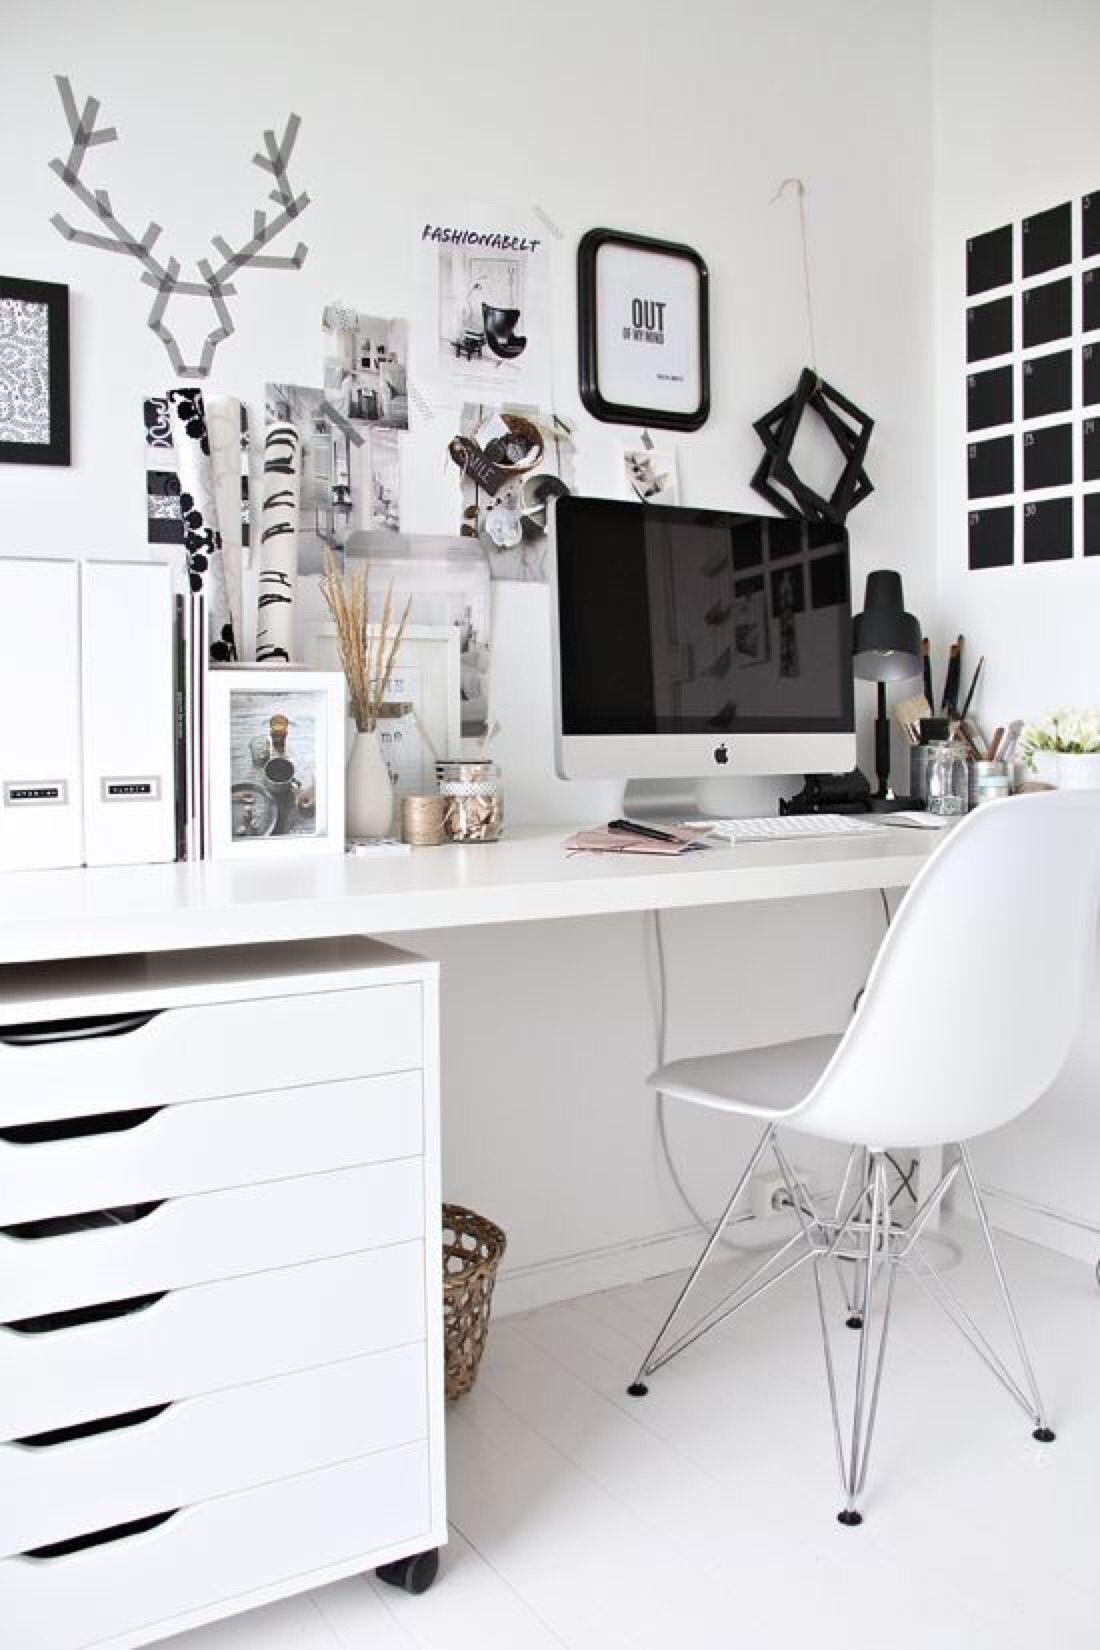 Pin by Ewak on future house | Pinterest | Apartment goals, Desk ...